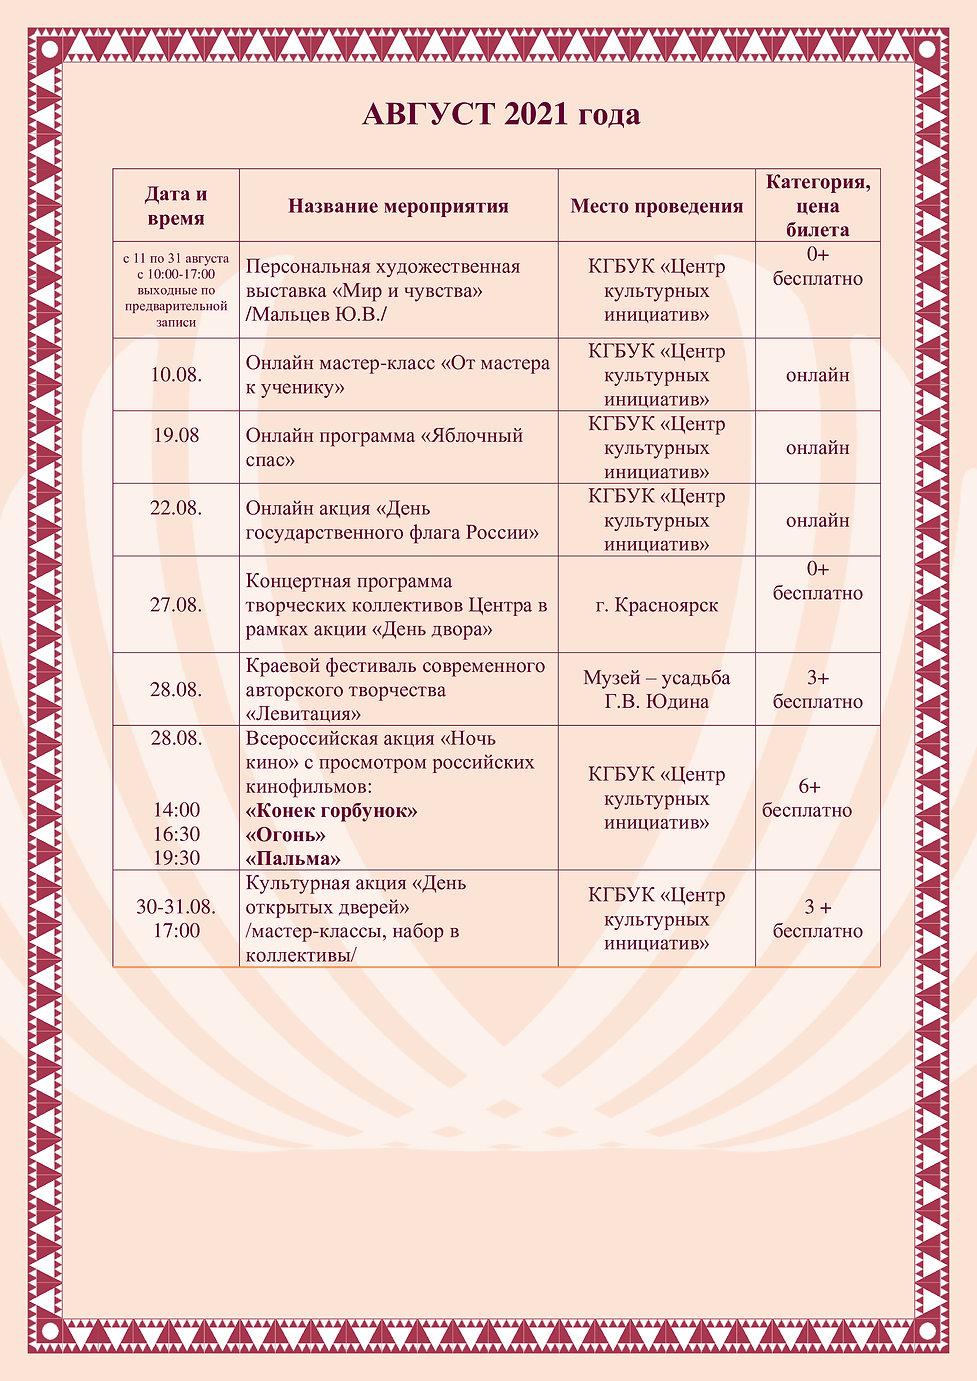 plan_na_vakhtu (1).jpg